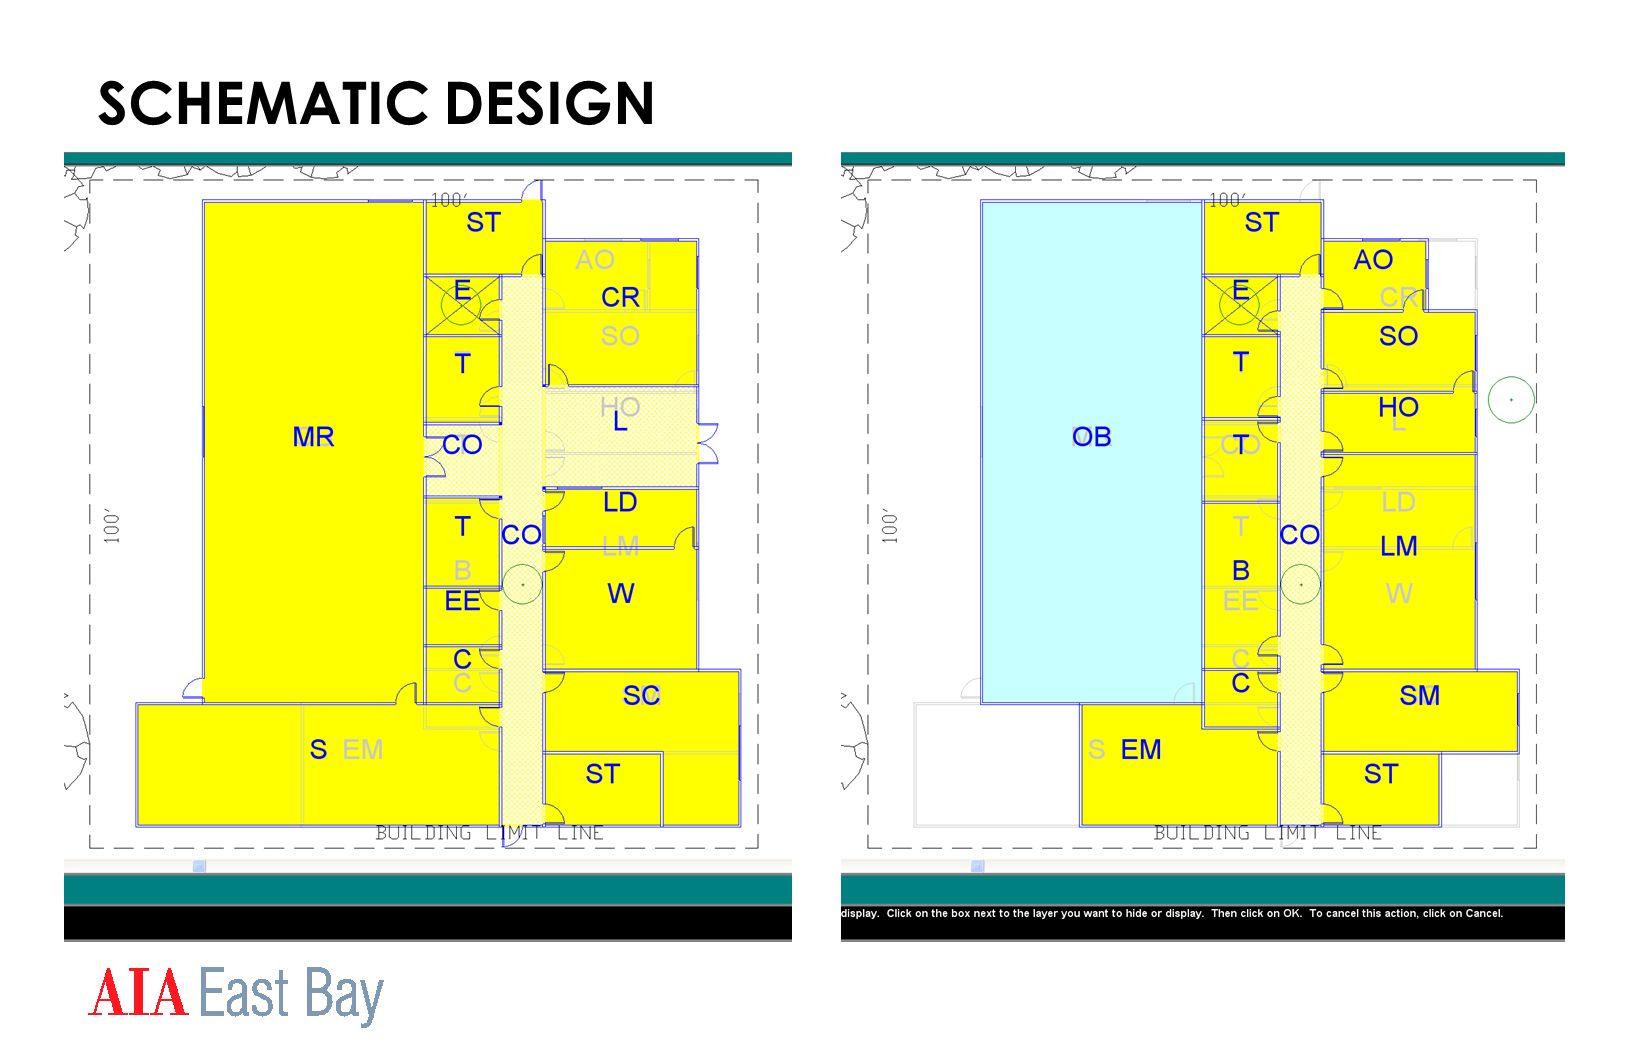 2008 A.R.E. GRAPHICS SEMINAR SITE PLANNING gray dougherty ... on retail schematic design, vimeo schematic design, simple schematic design, air conditioner schematic design, test prep schematic design, building layout schematic design, are forum schematic design, revit schematic design, at at schematic design,